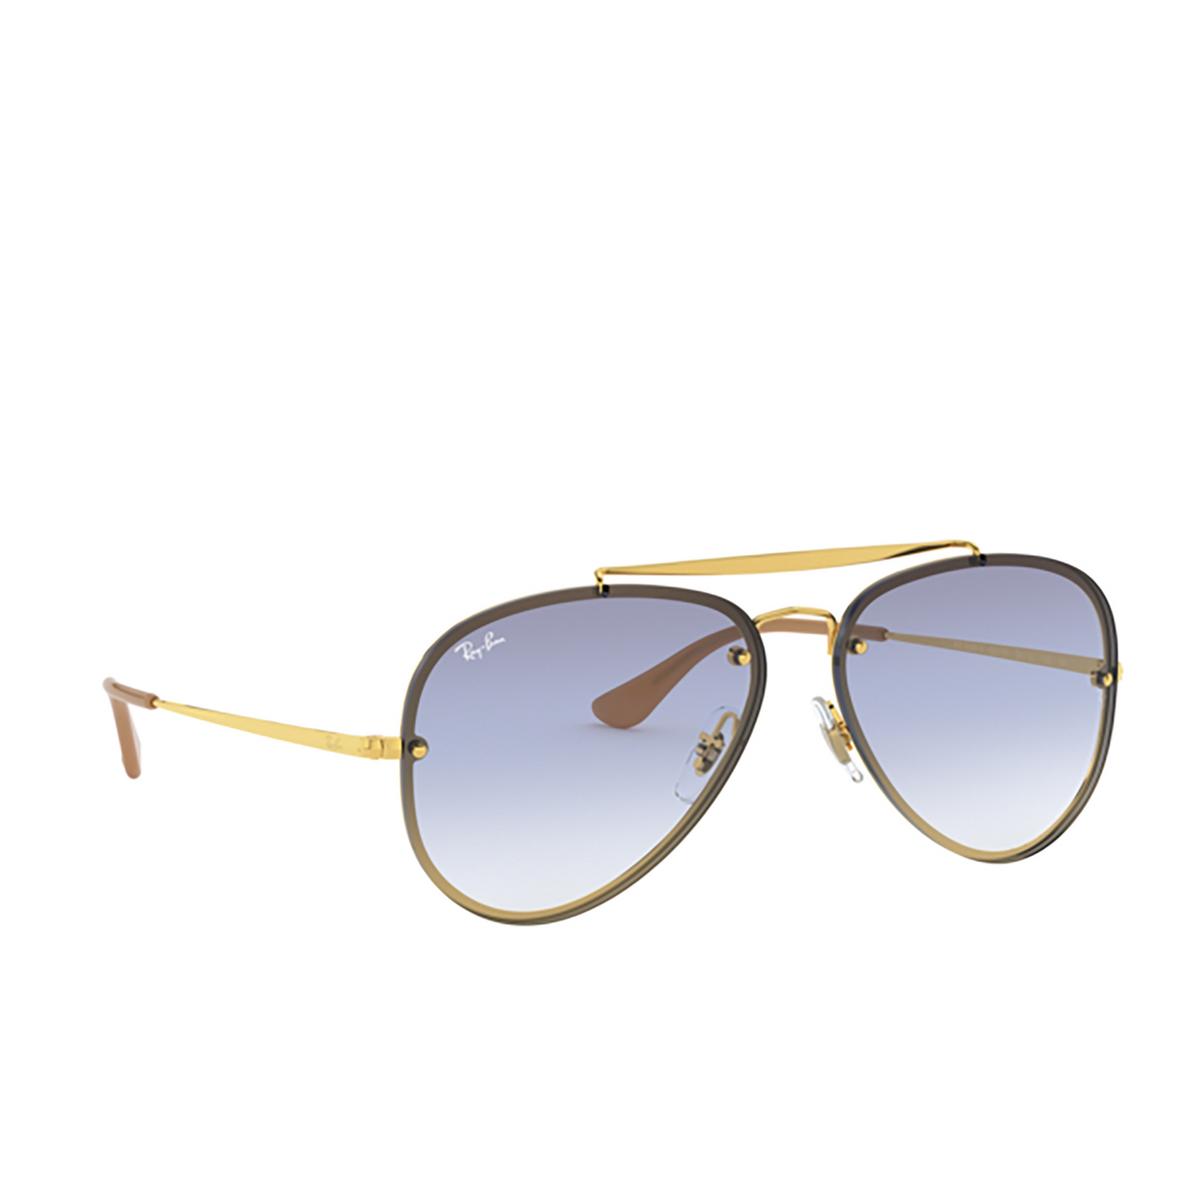 Ray-Ban® Aviator Sunglasses: Blaze Aviator RB3584N color Arista 001/19 - 2/3.